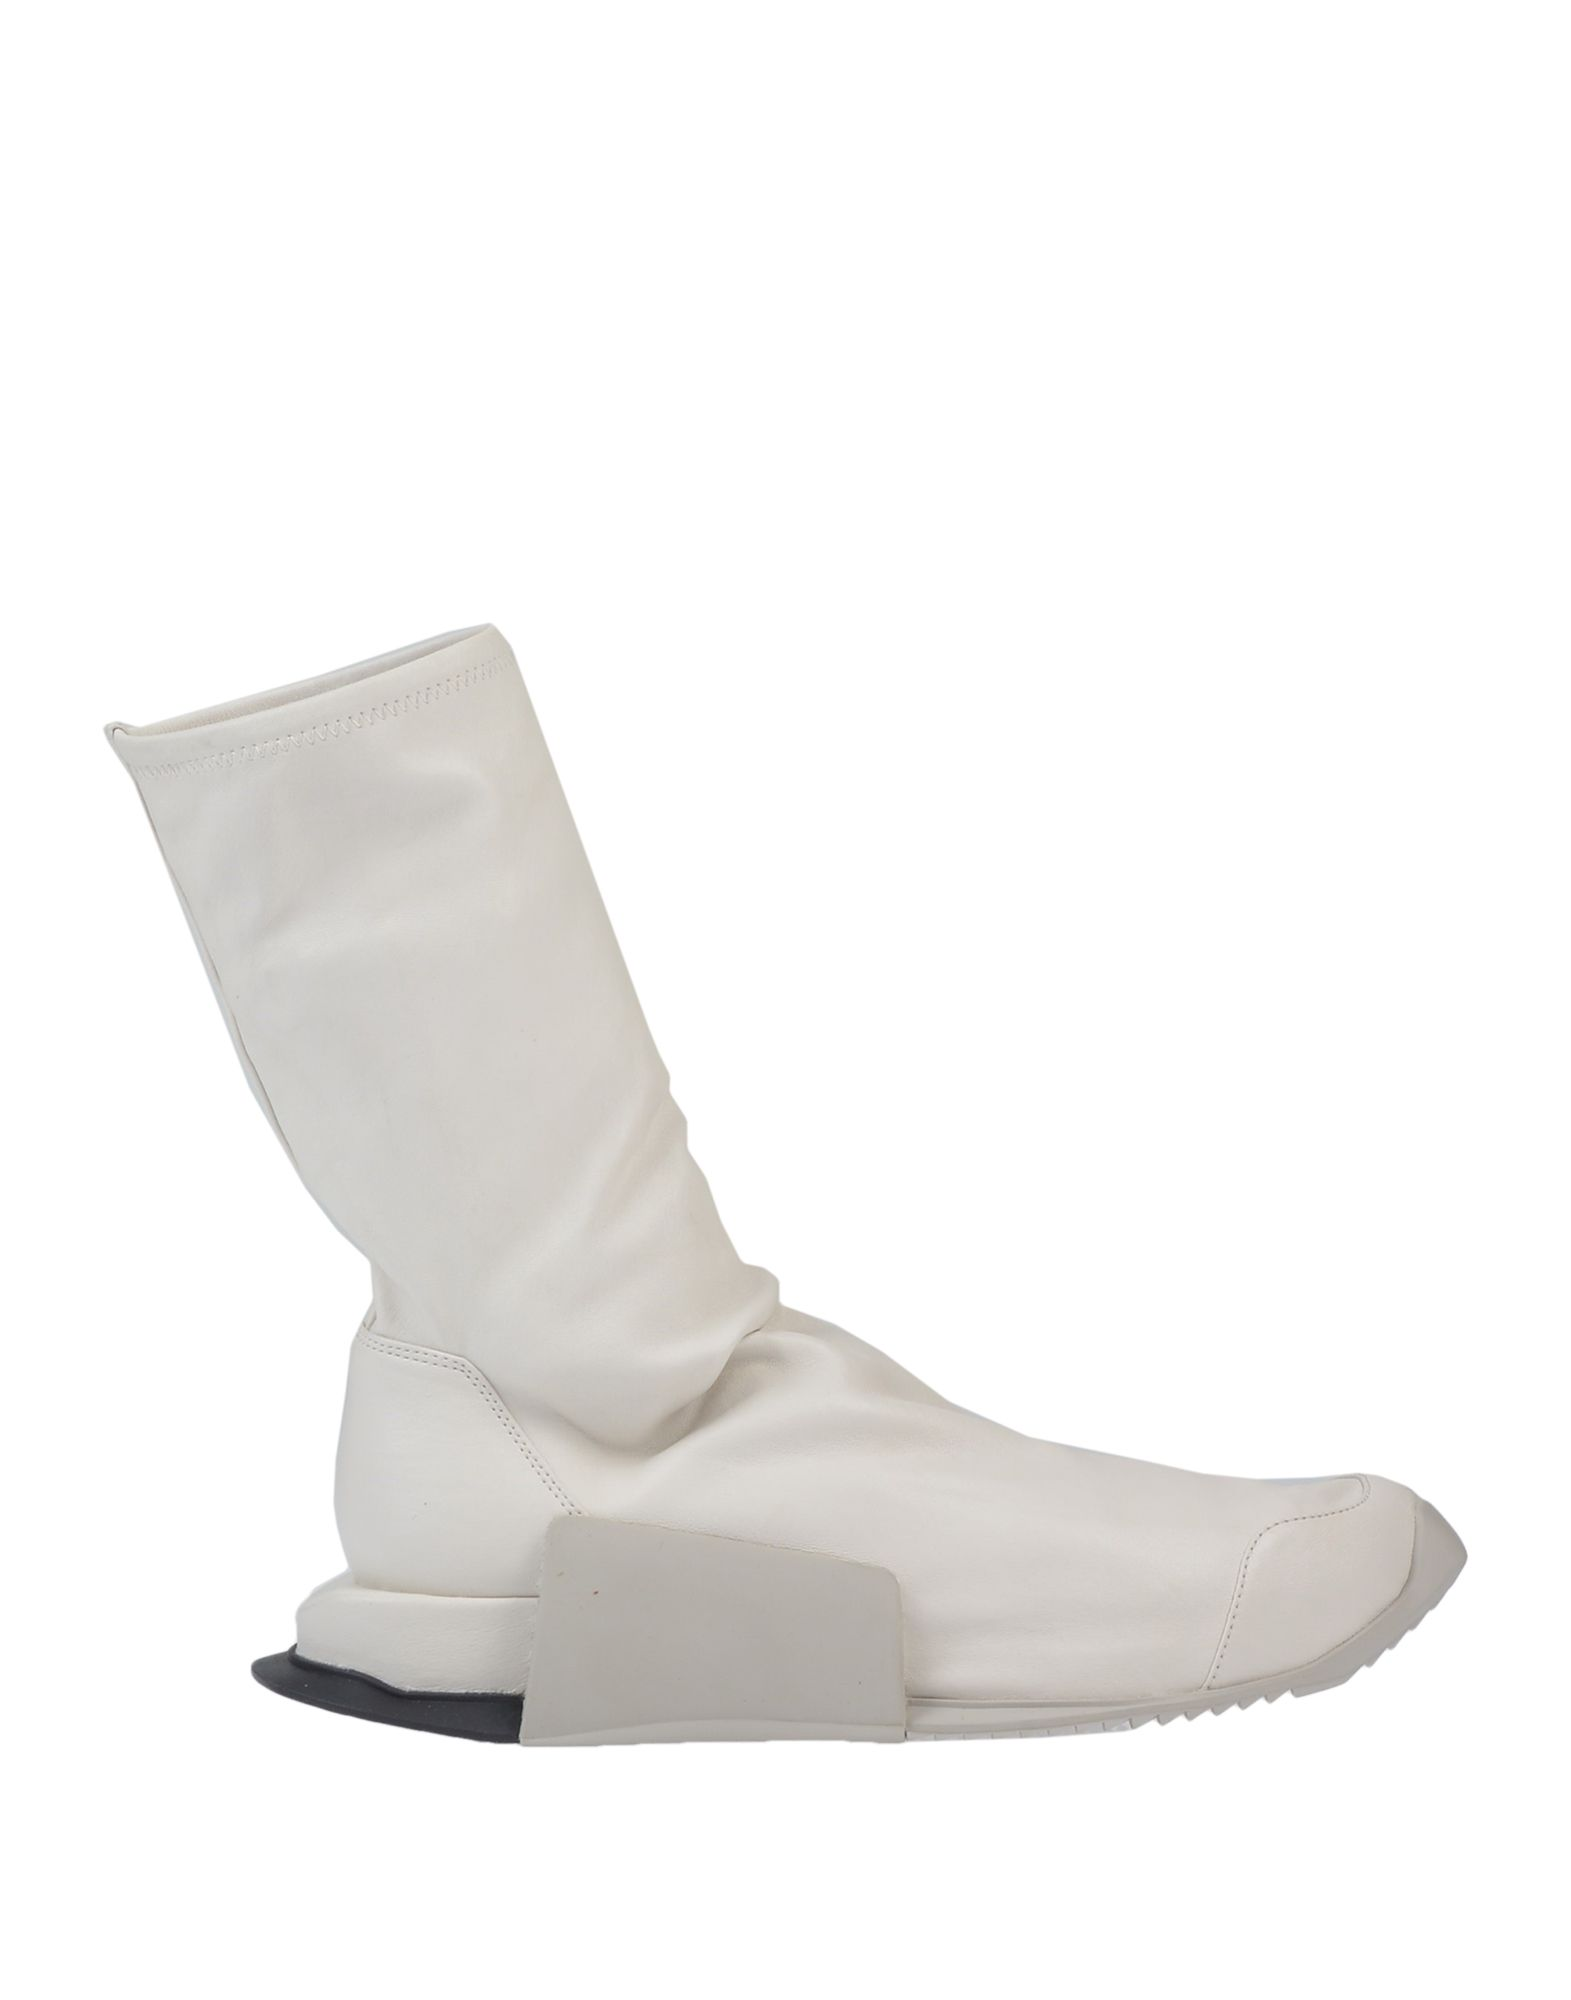 super popular 7dde8 7222a RICK OWENS x ADIDAS Boots - Footwear   YOOX.COM